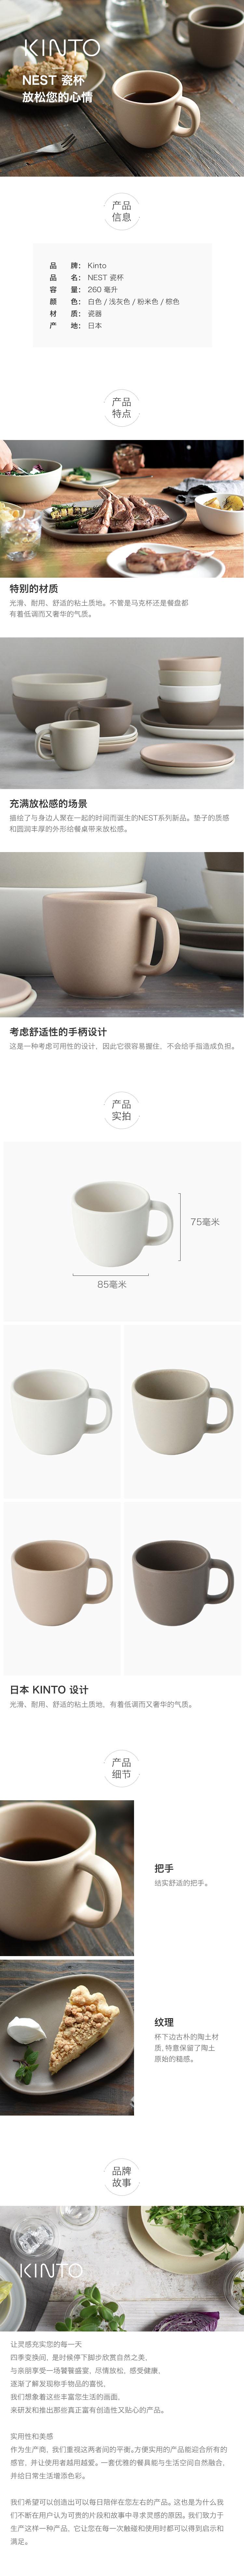 NEST 瓷杯